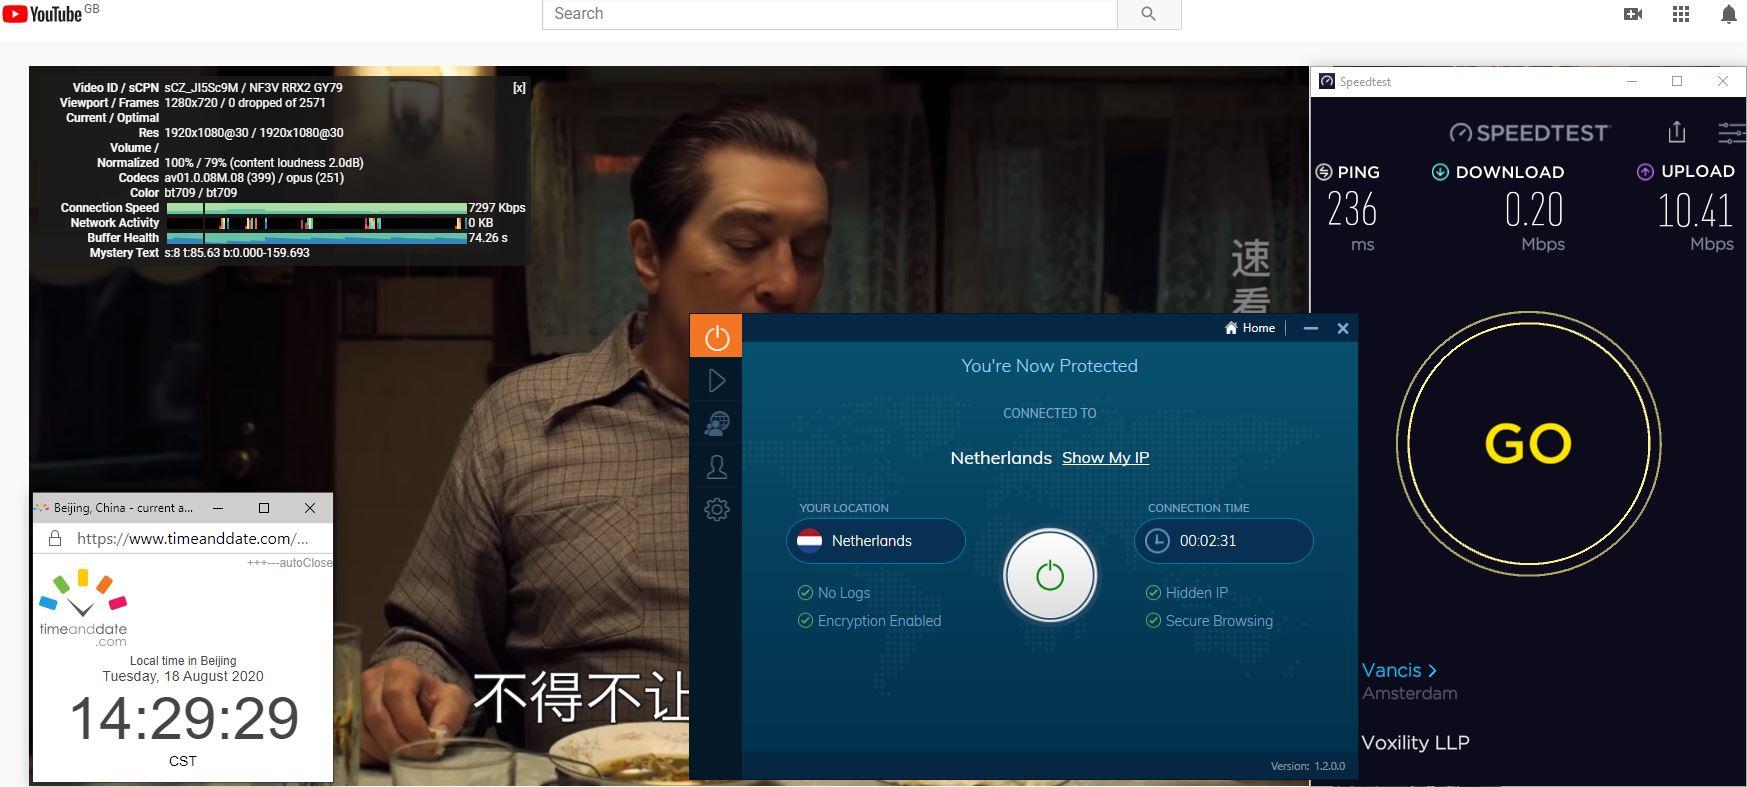 Windows10 IvacyVPN Netherlands 中国VPN 翻墙 科学上网 翻墙速度测试 - 20200818